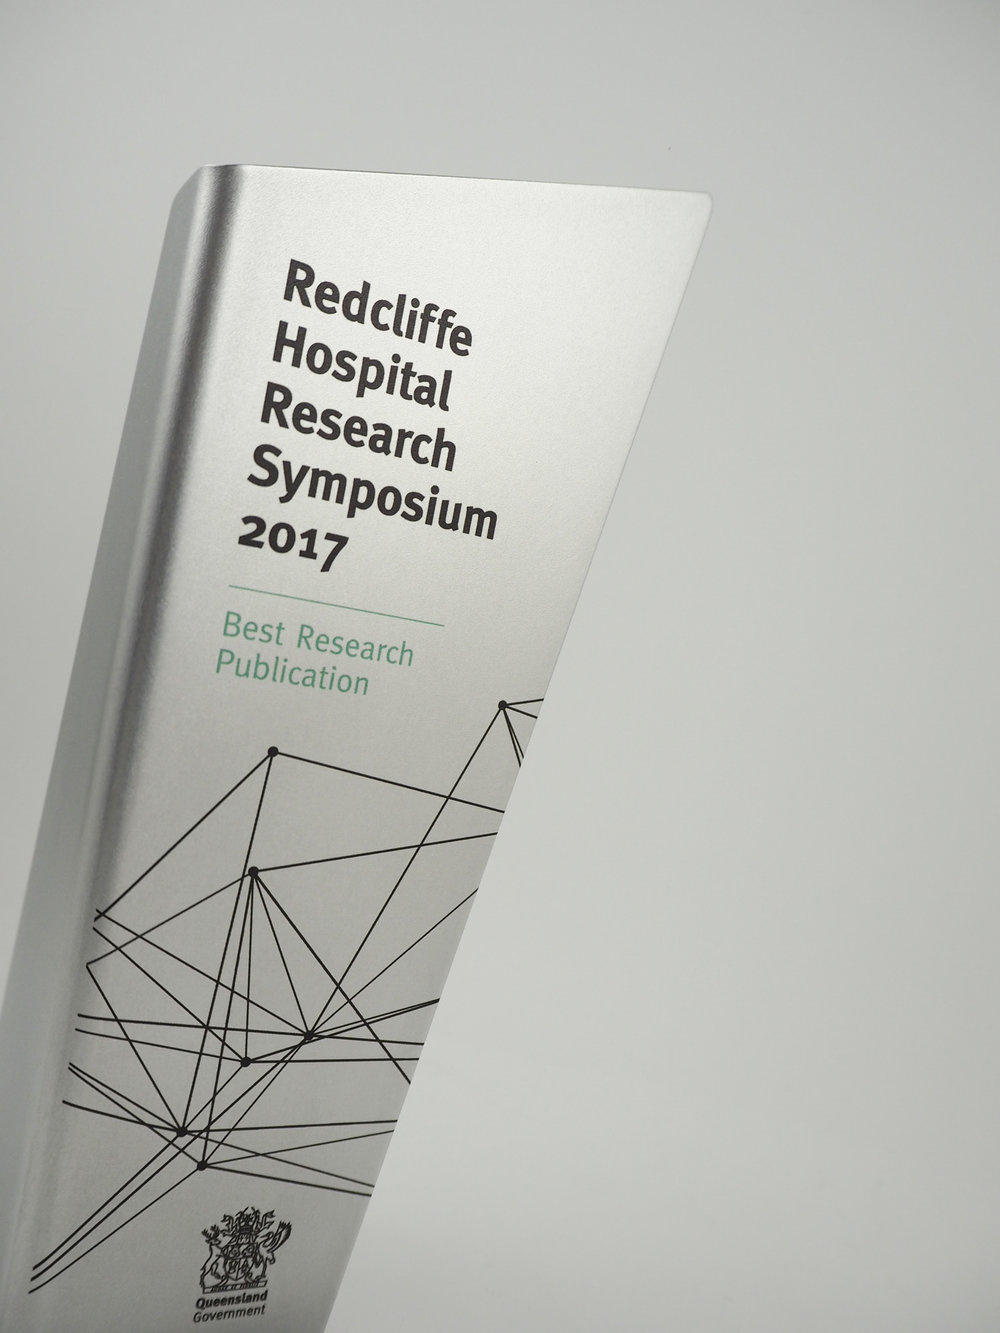 Redcliffe-Hospital-Symposium-eco-aluminium-trophy-award-05.jpg